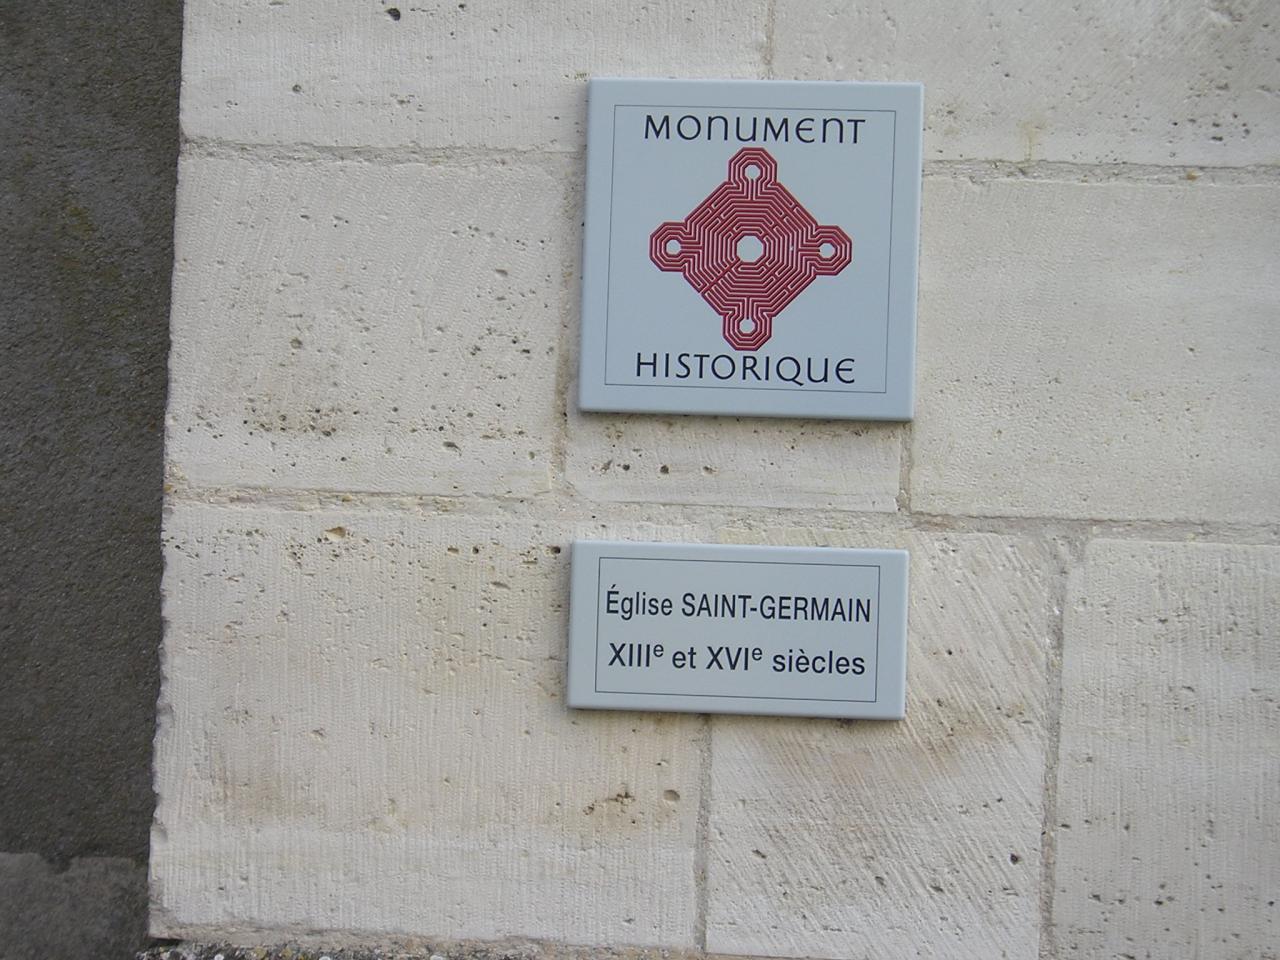 Nogent l'Artaud (Aisne) Plaque église en 2004